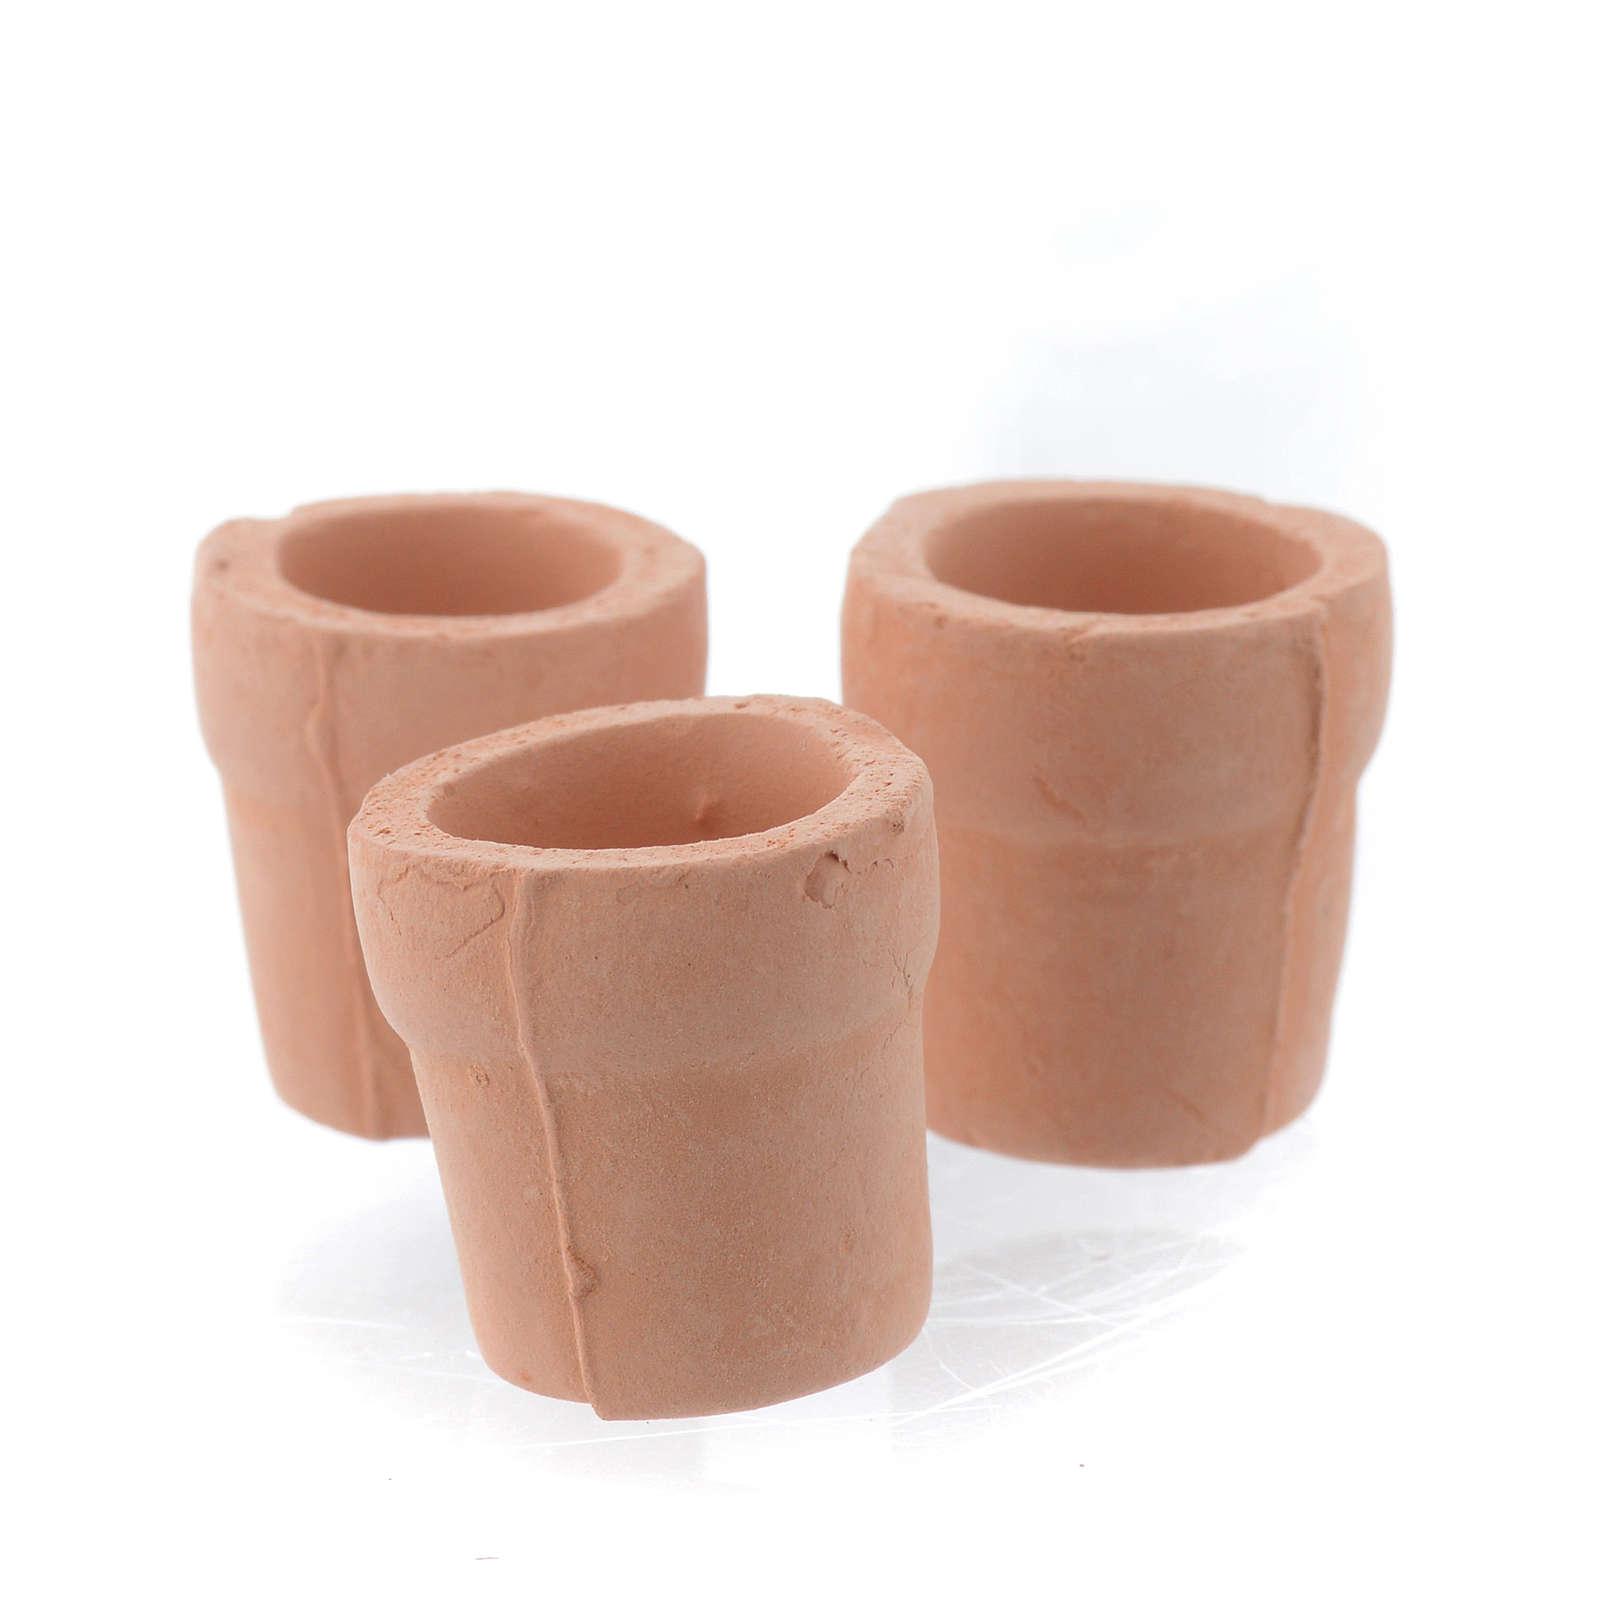 Nativity set accessory, set of 3 terracotta jars 4